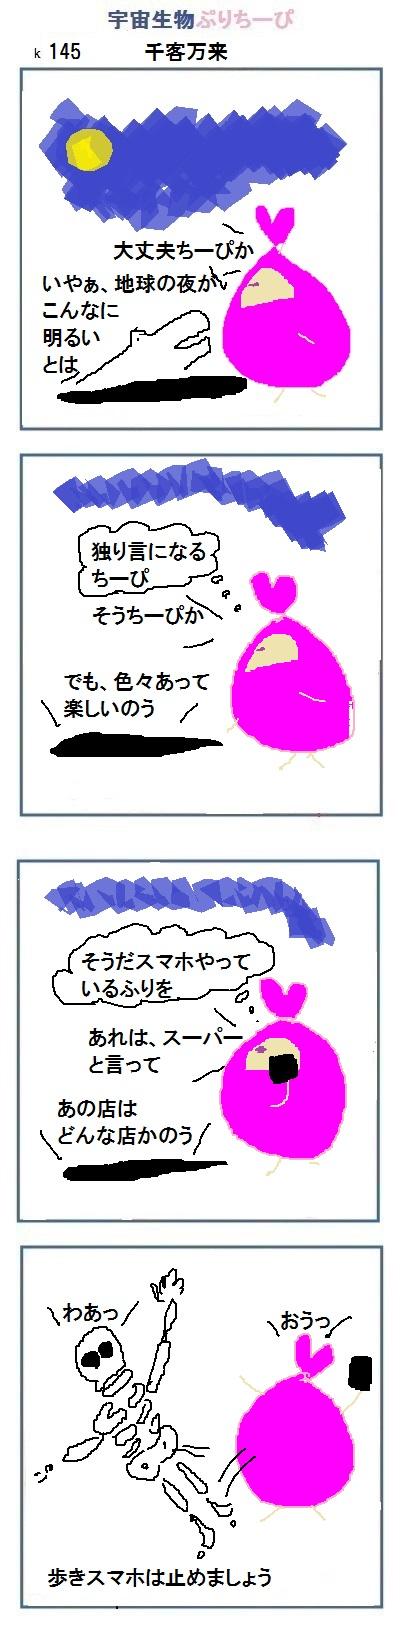 161028_k145.jpg